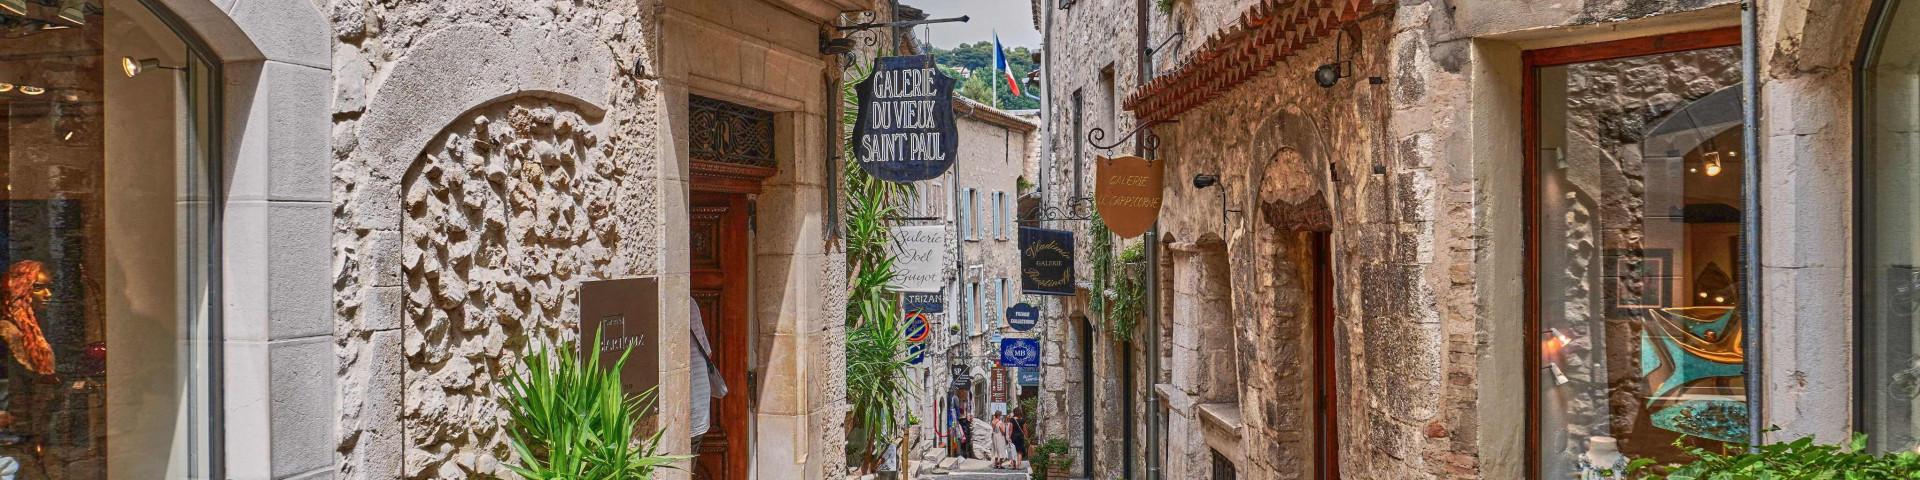 Rue Grande, Saint Paul de Vence